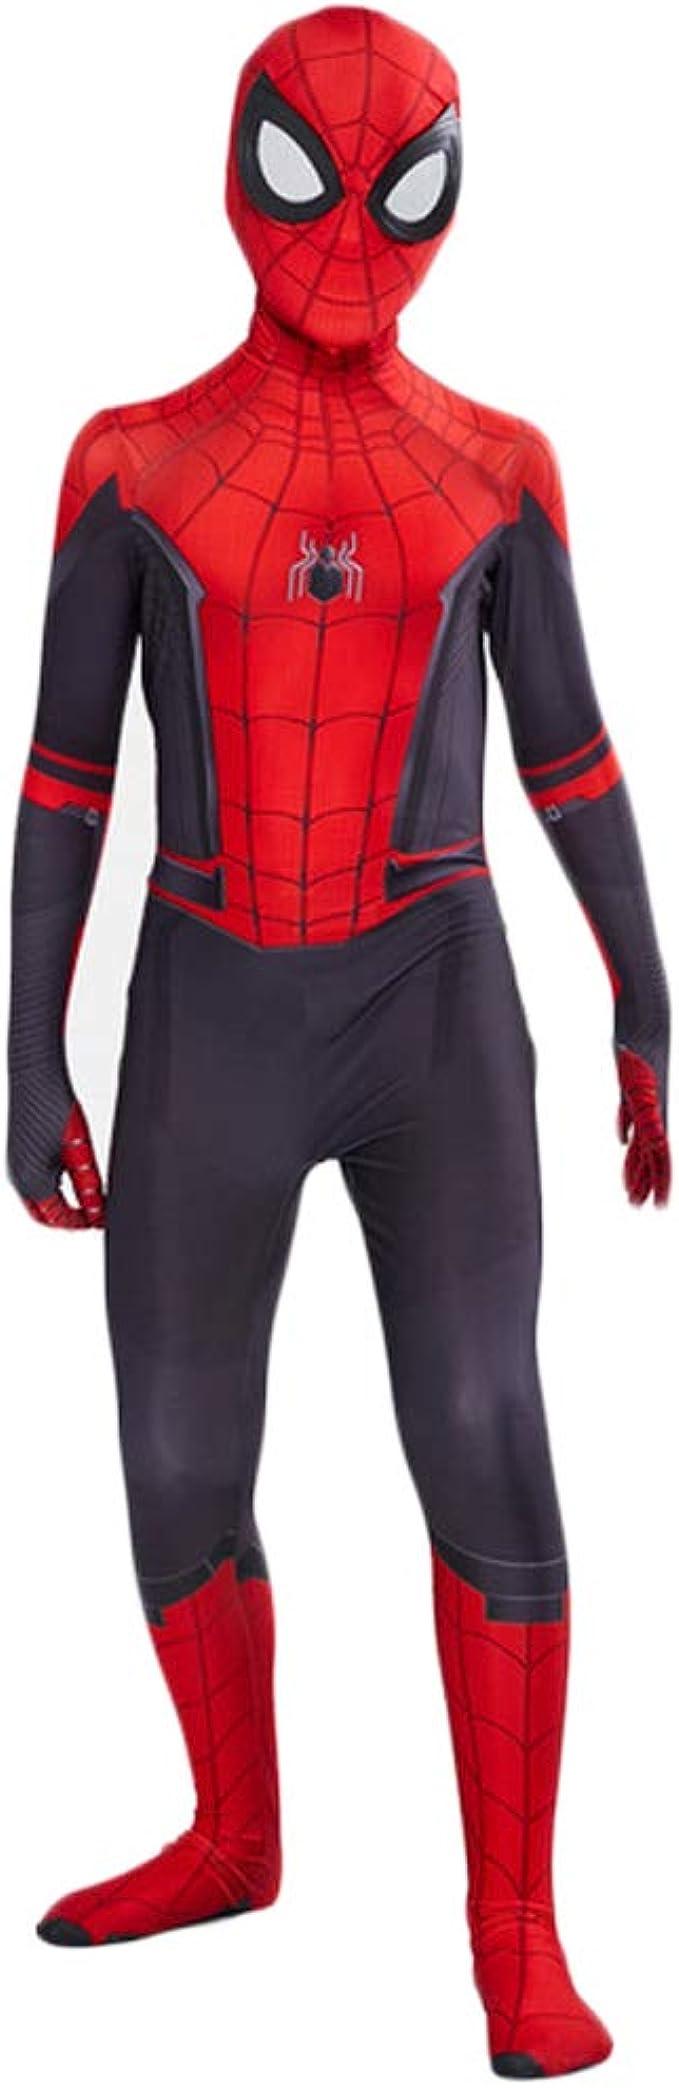 Da Mai Kids Lycra Superhero Suits Halloween ... - Amazon.com